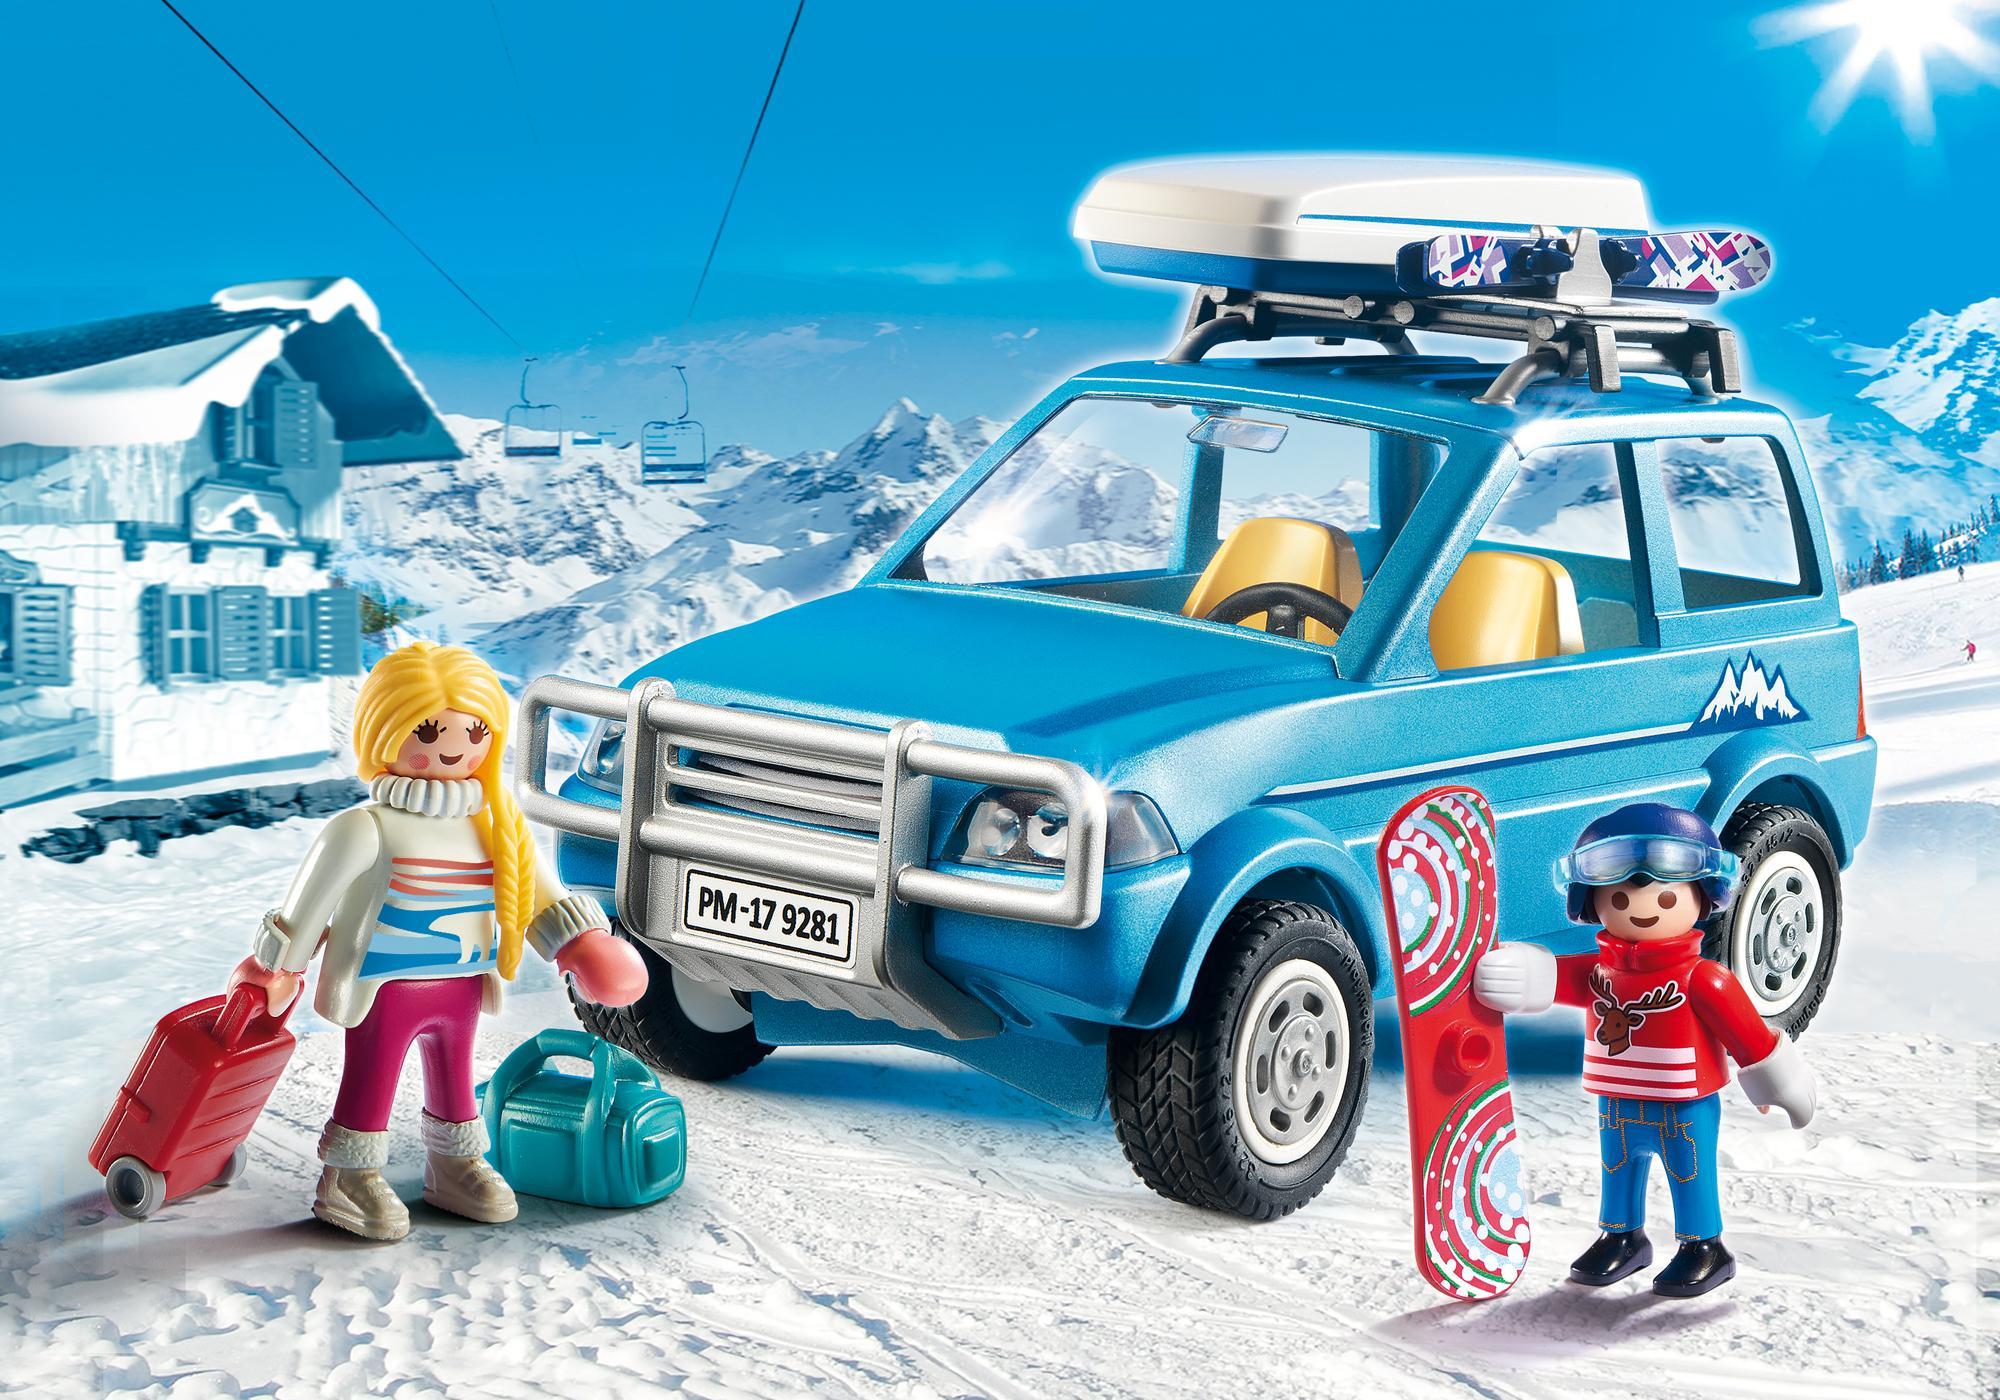 http://media.playmobil.com/i/playmobil/9281_product_detail